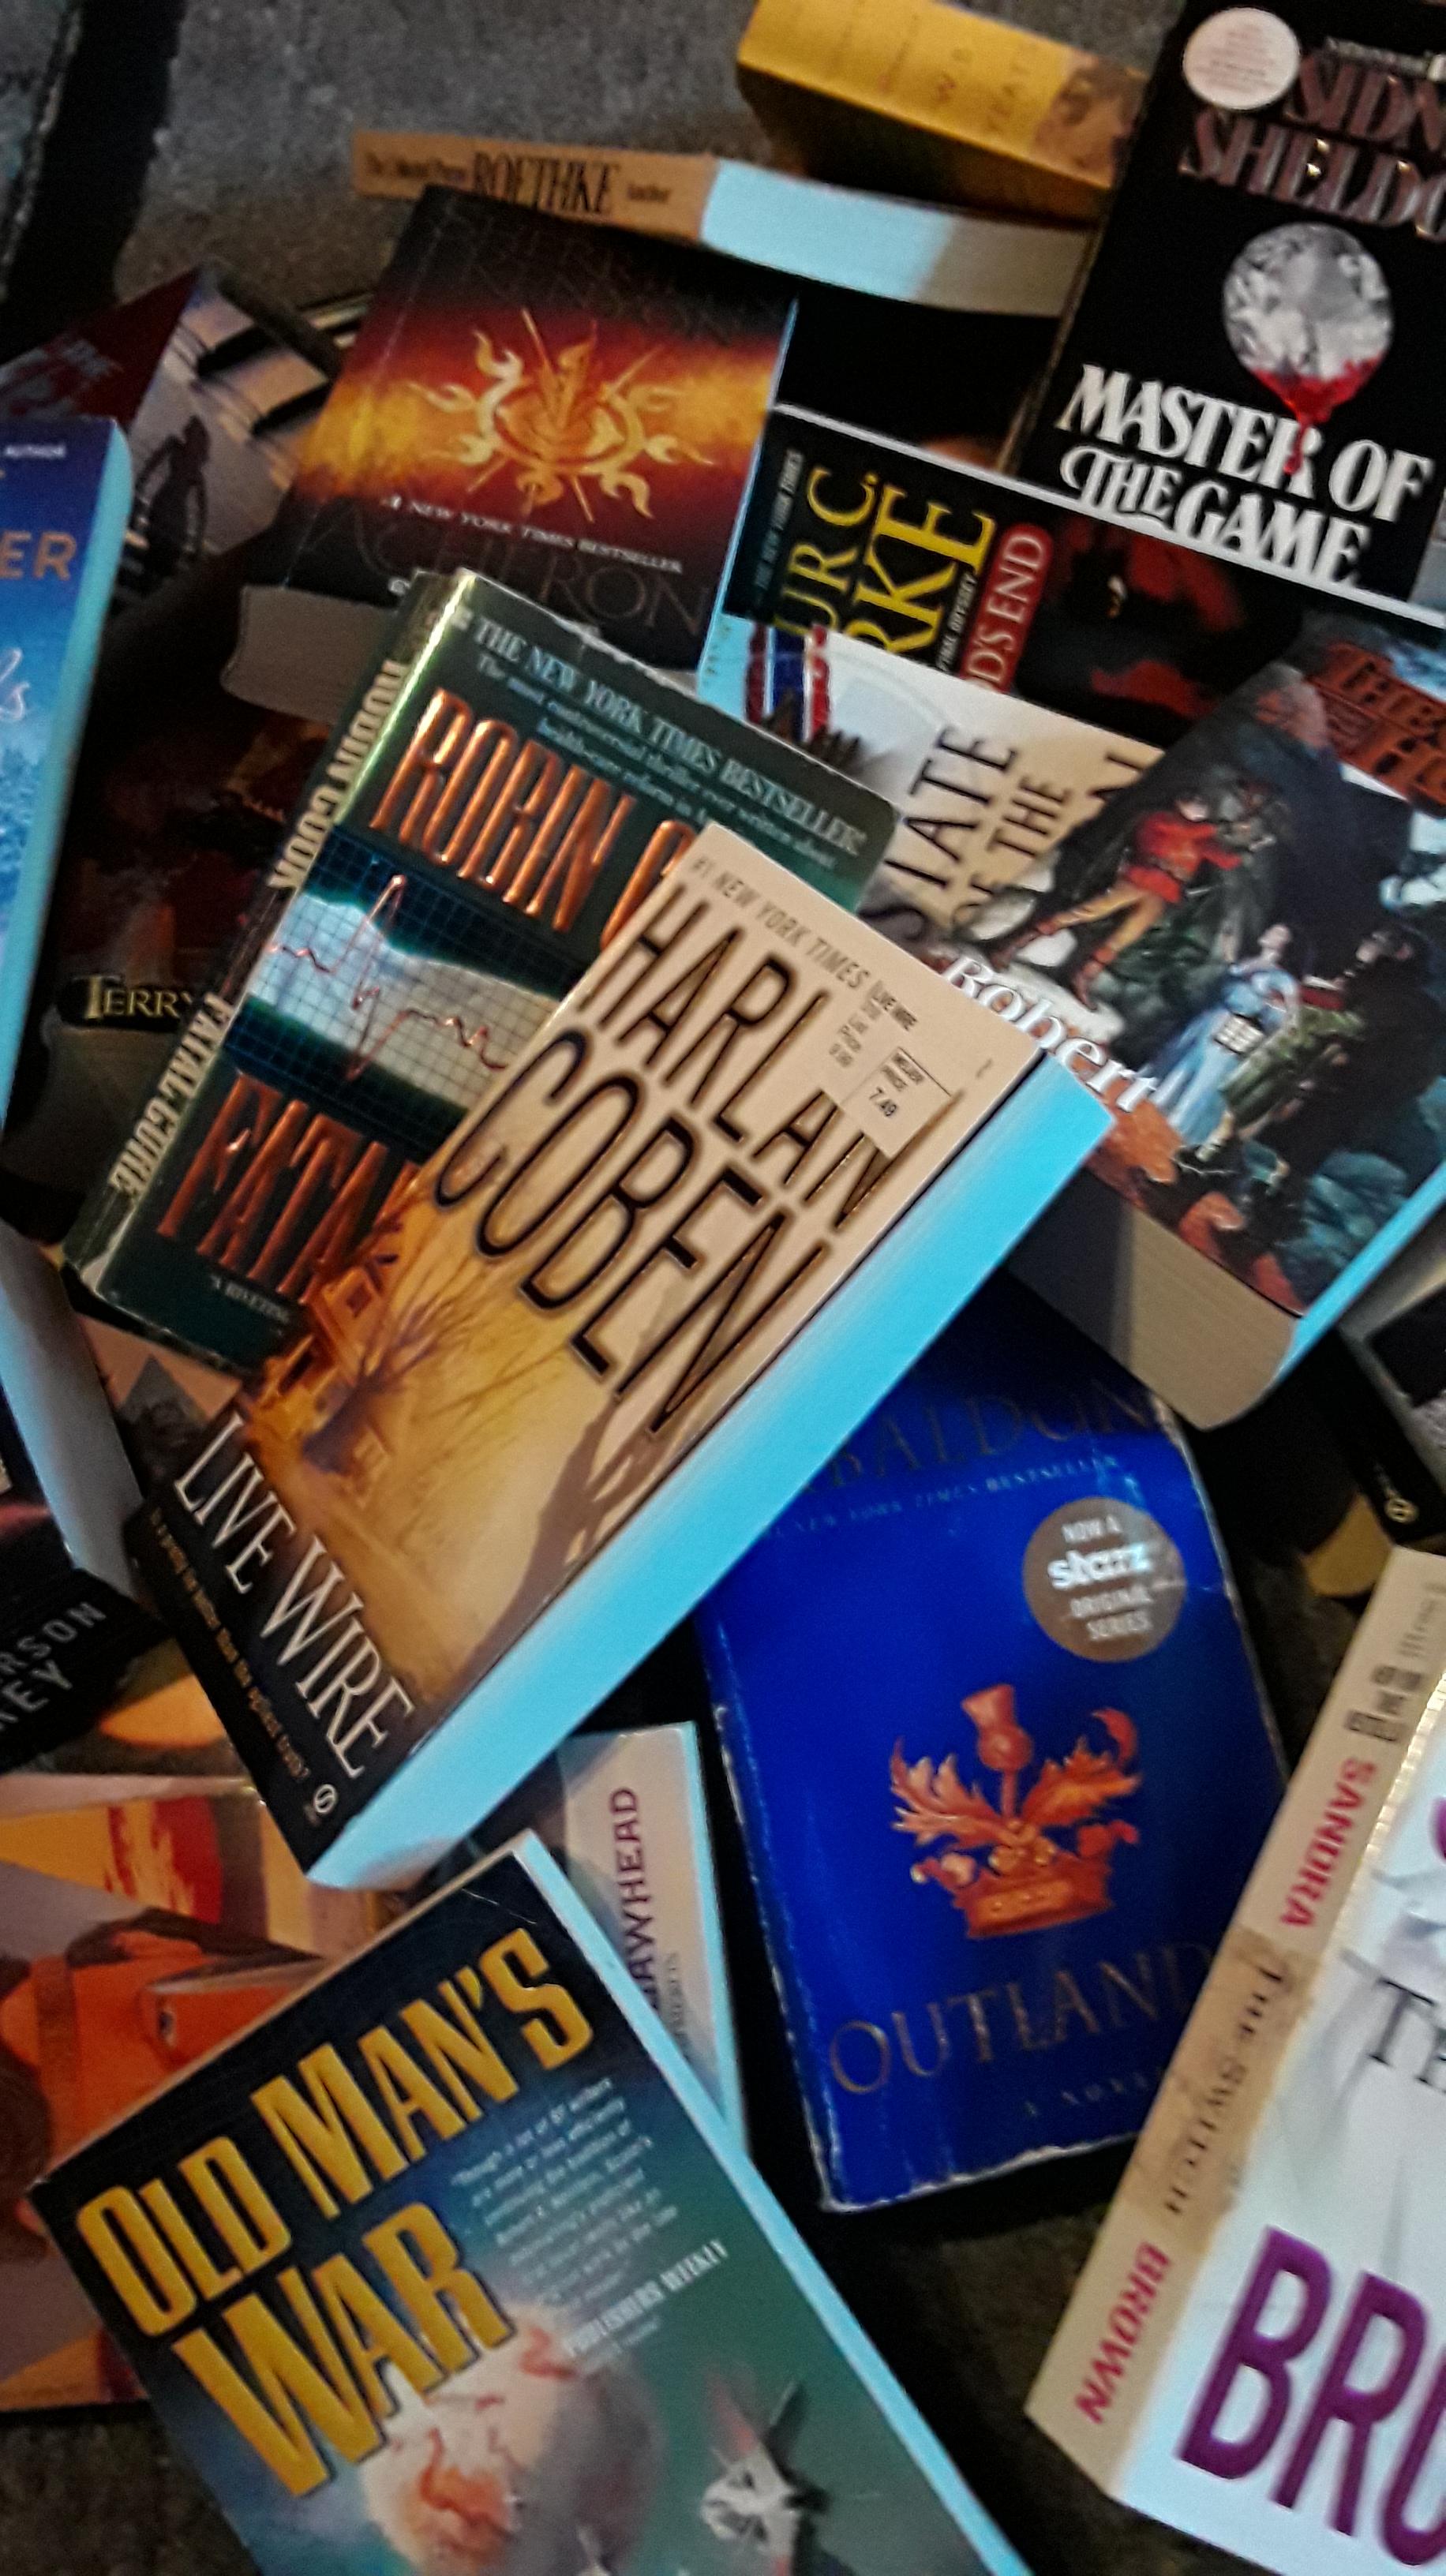 jumble of books